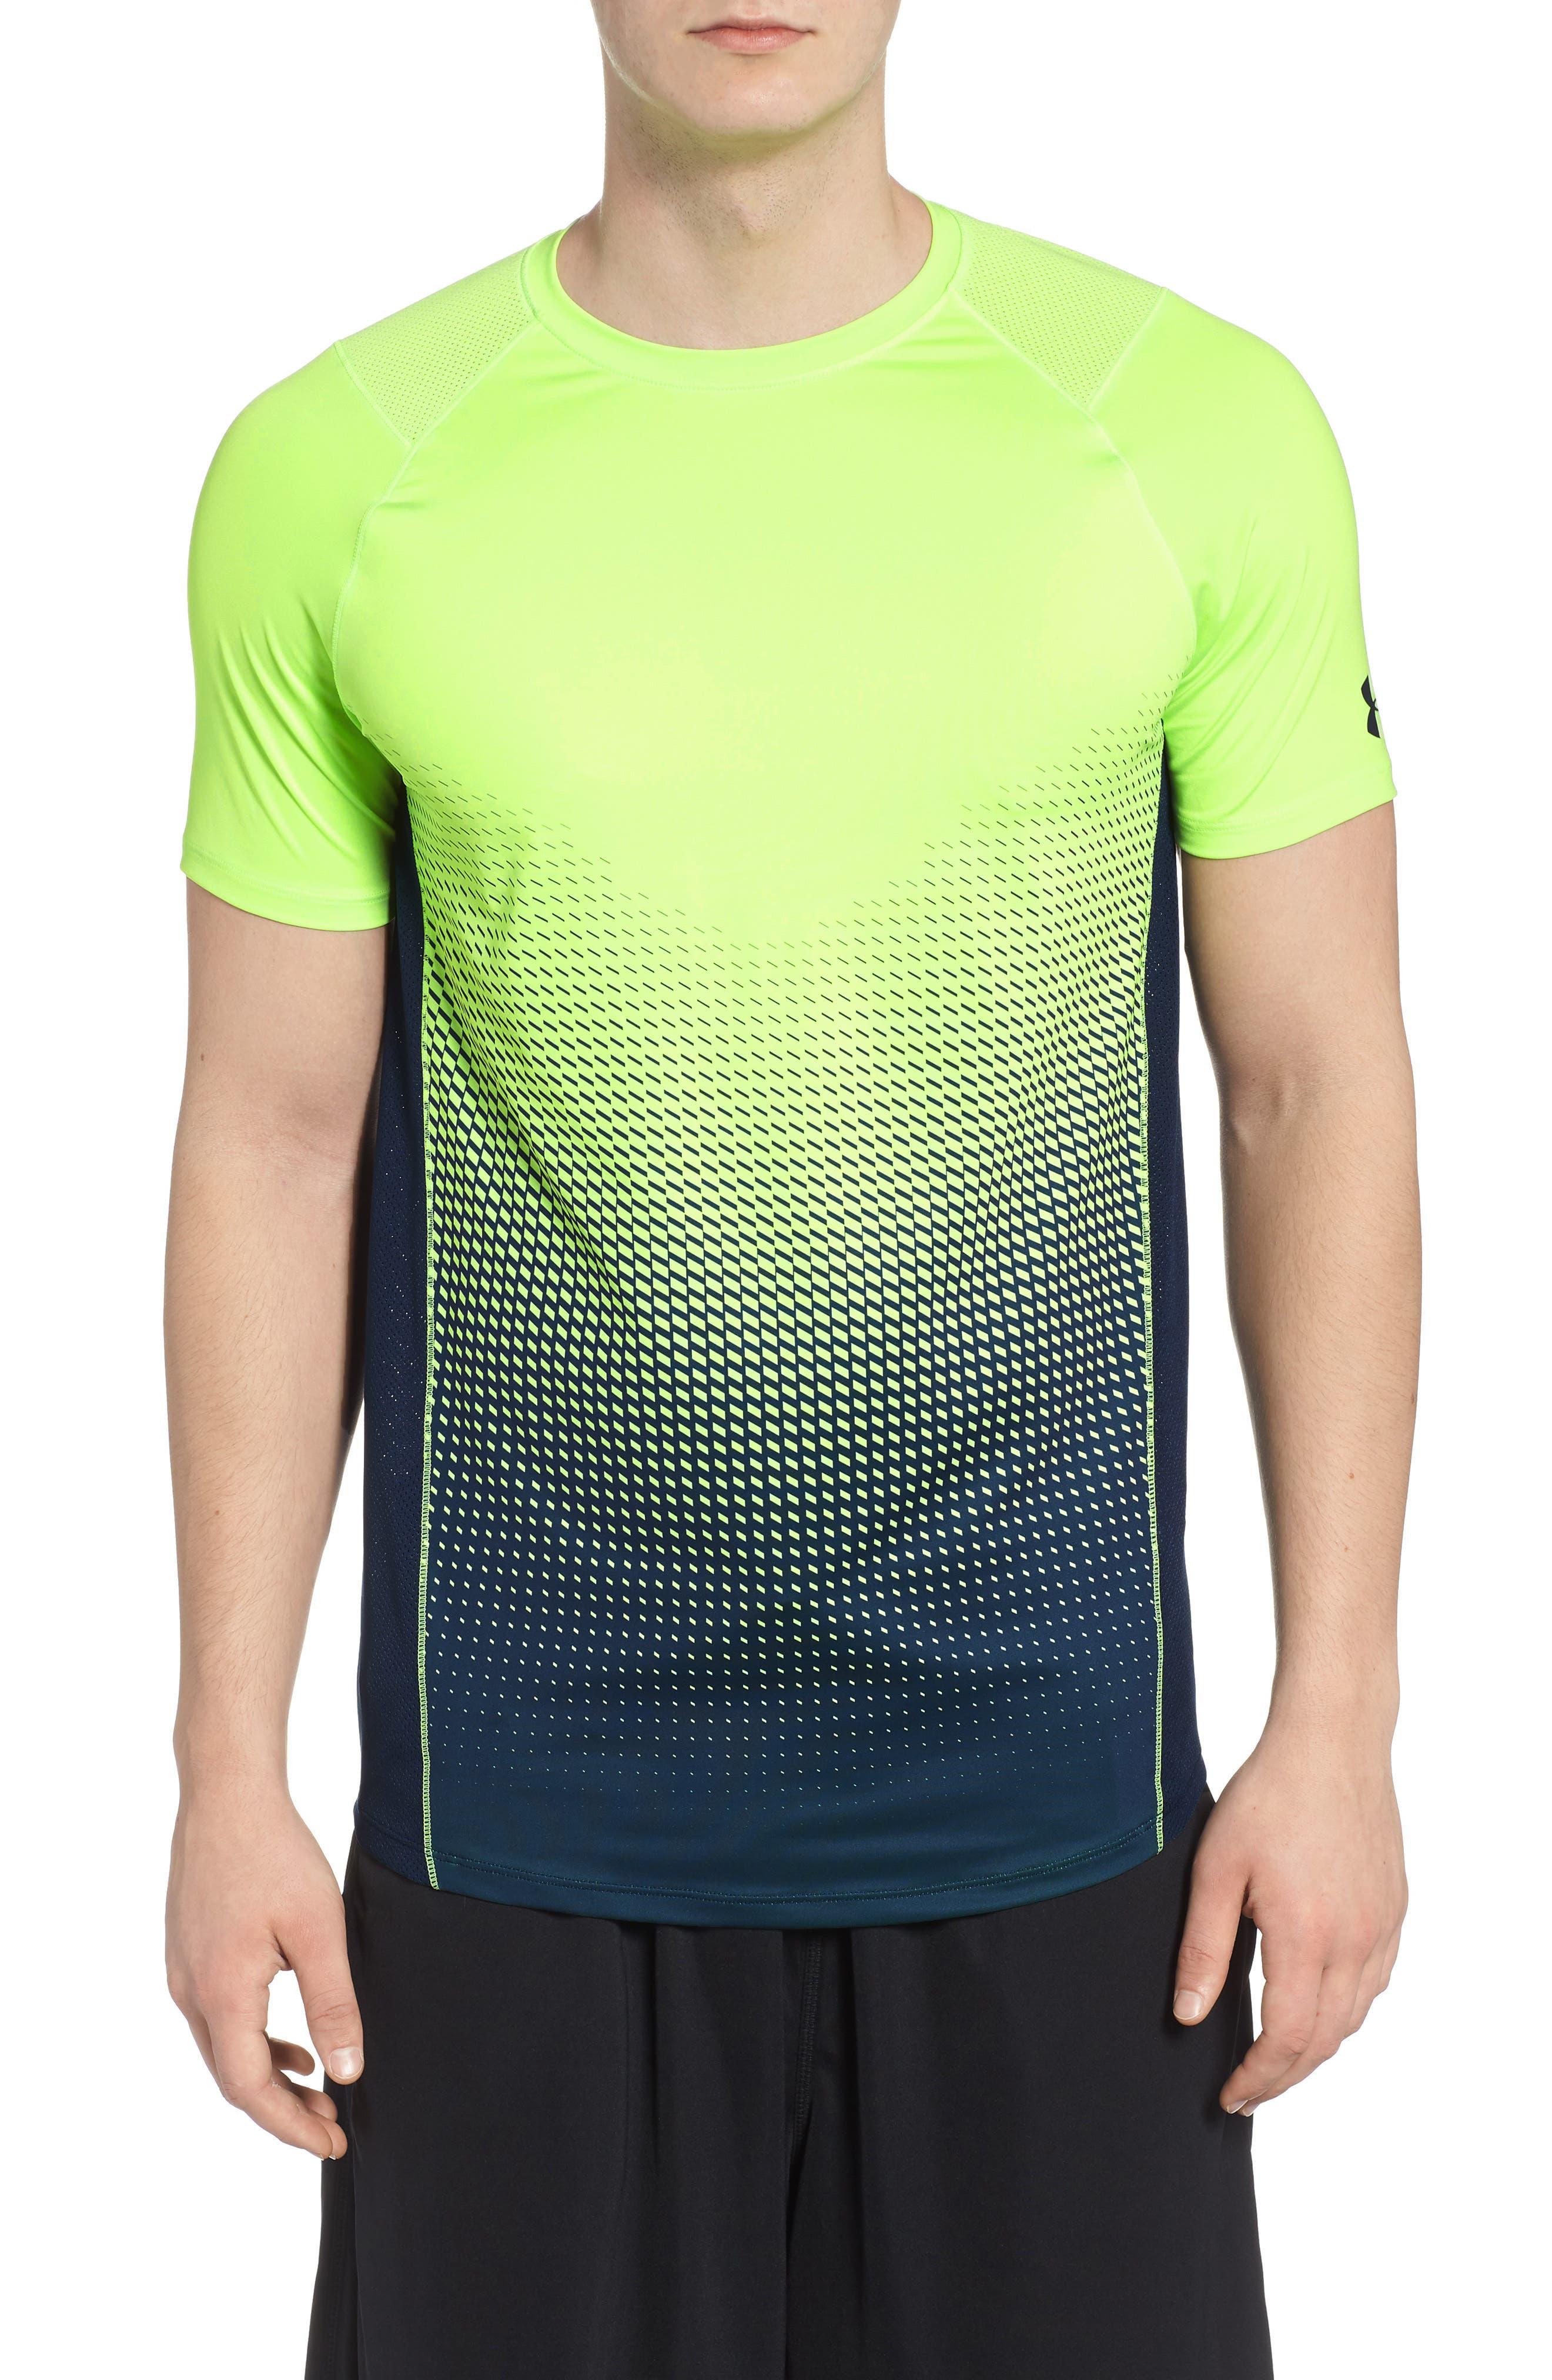 MK1 Dash Crewneck T-Shirt,                             Main thumbnail 1, color,                             Lime / Academy / Graphite